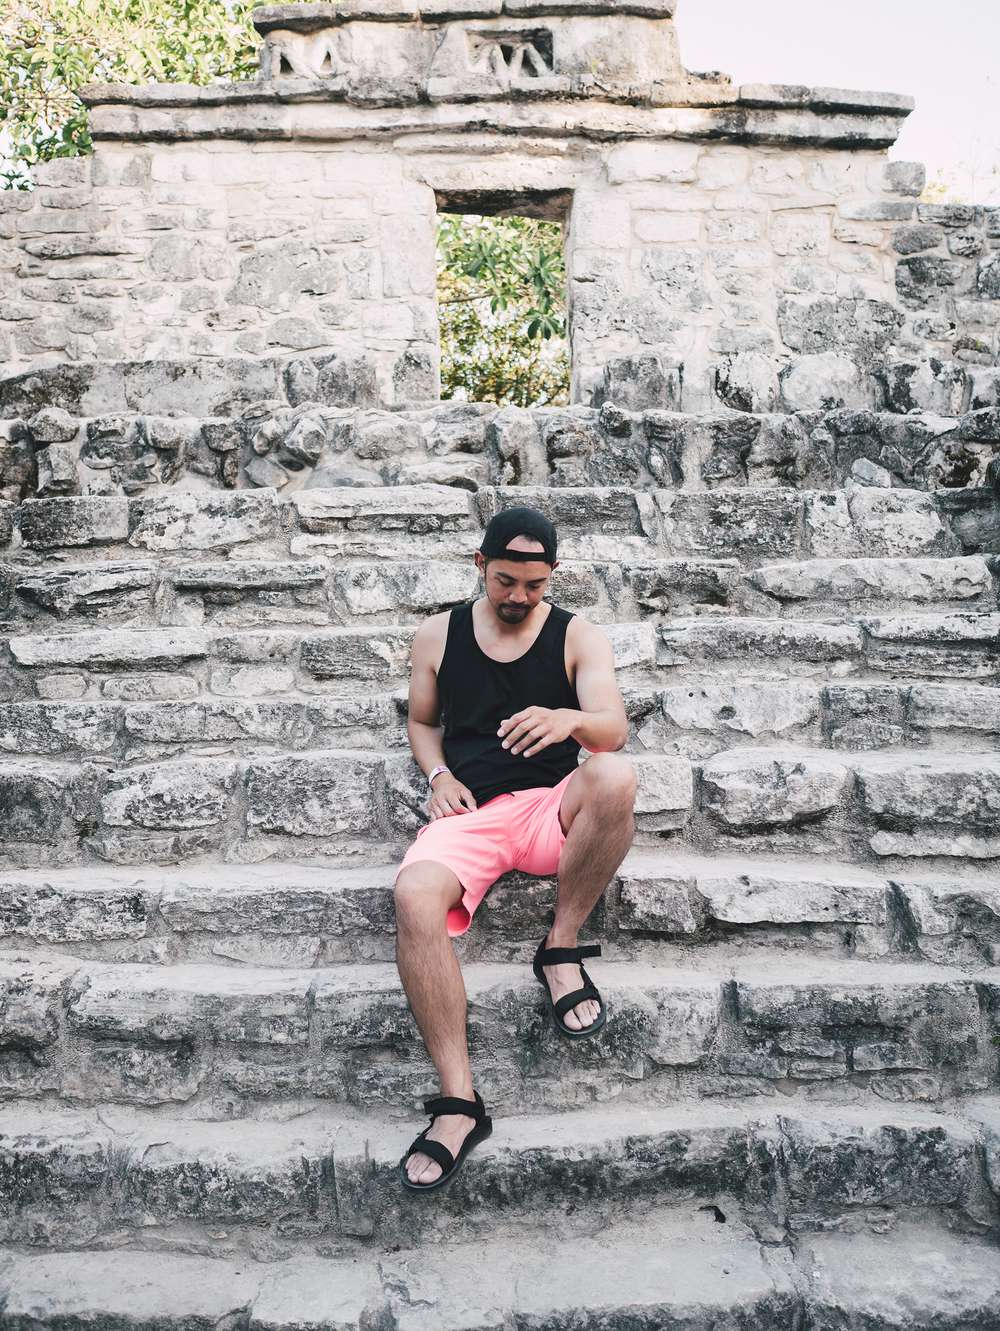 Adrian Narvaez sitting on steps of Mayan ruins